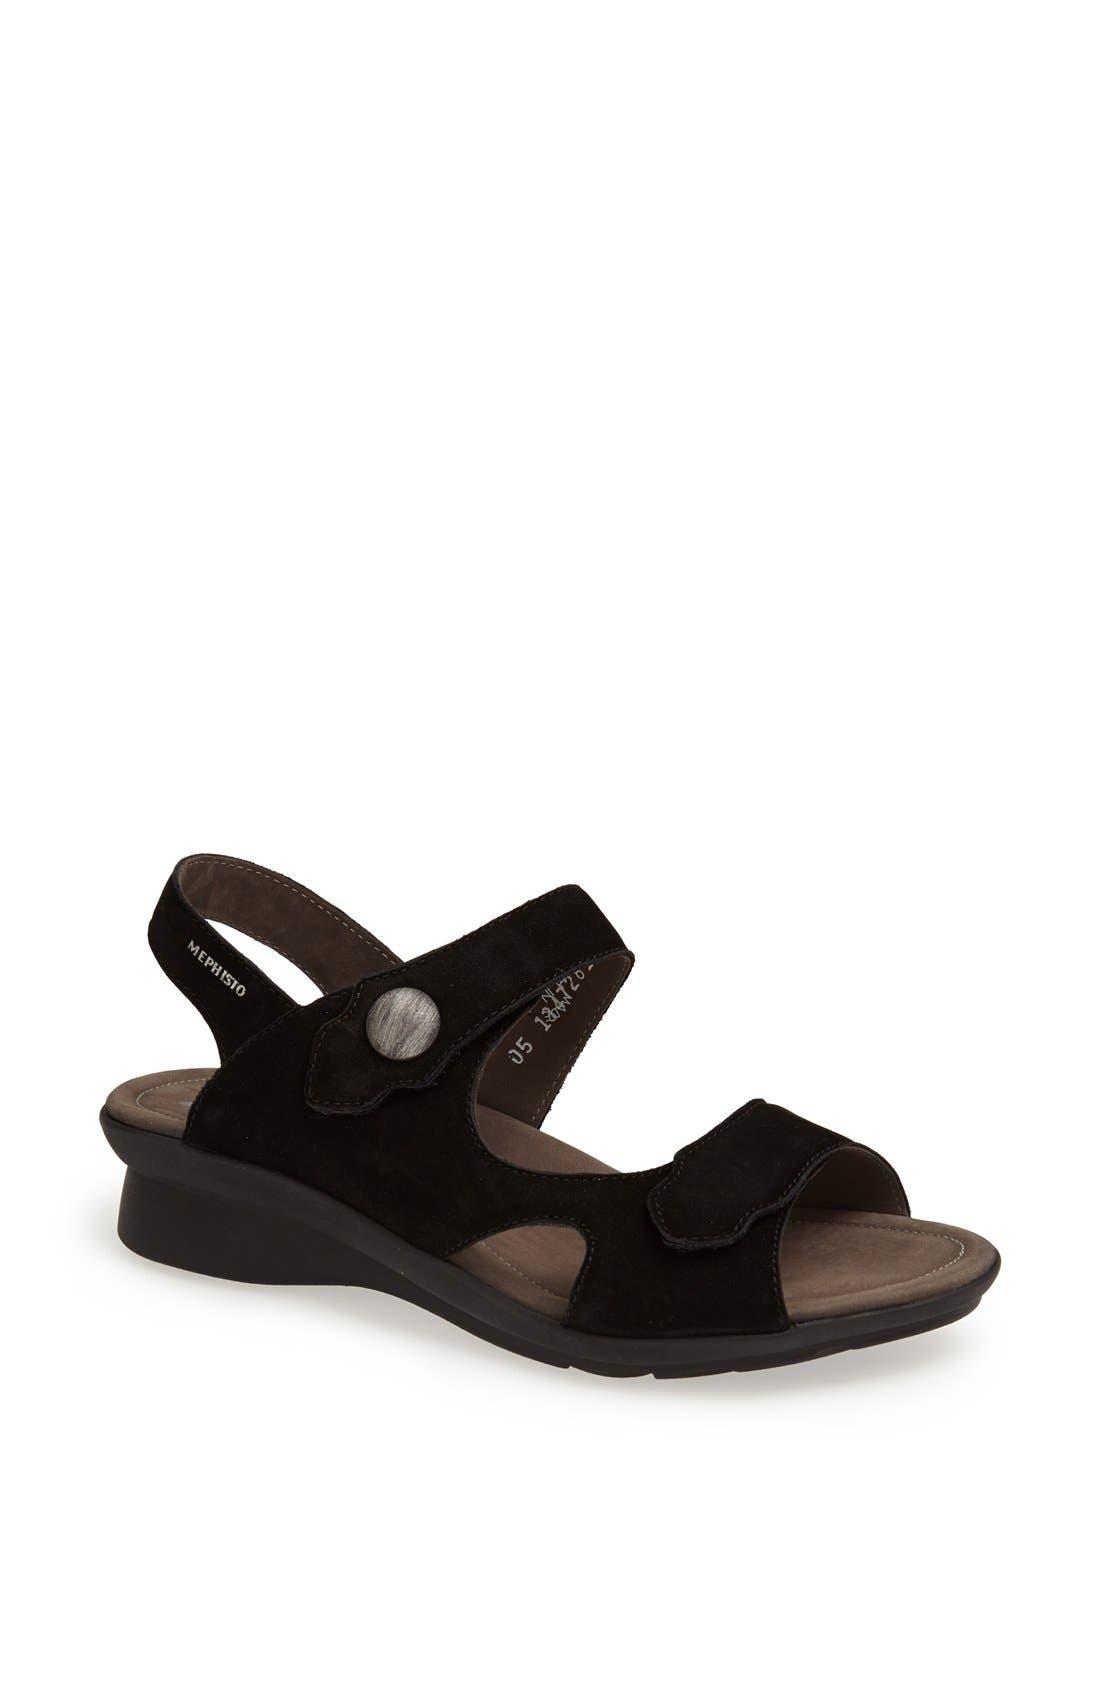 'Prudy' Leather Sandal,                             Main thumbnail 1, color,                             BLACK NUBUCK LEATHER